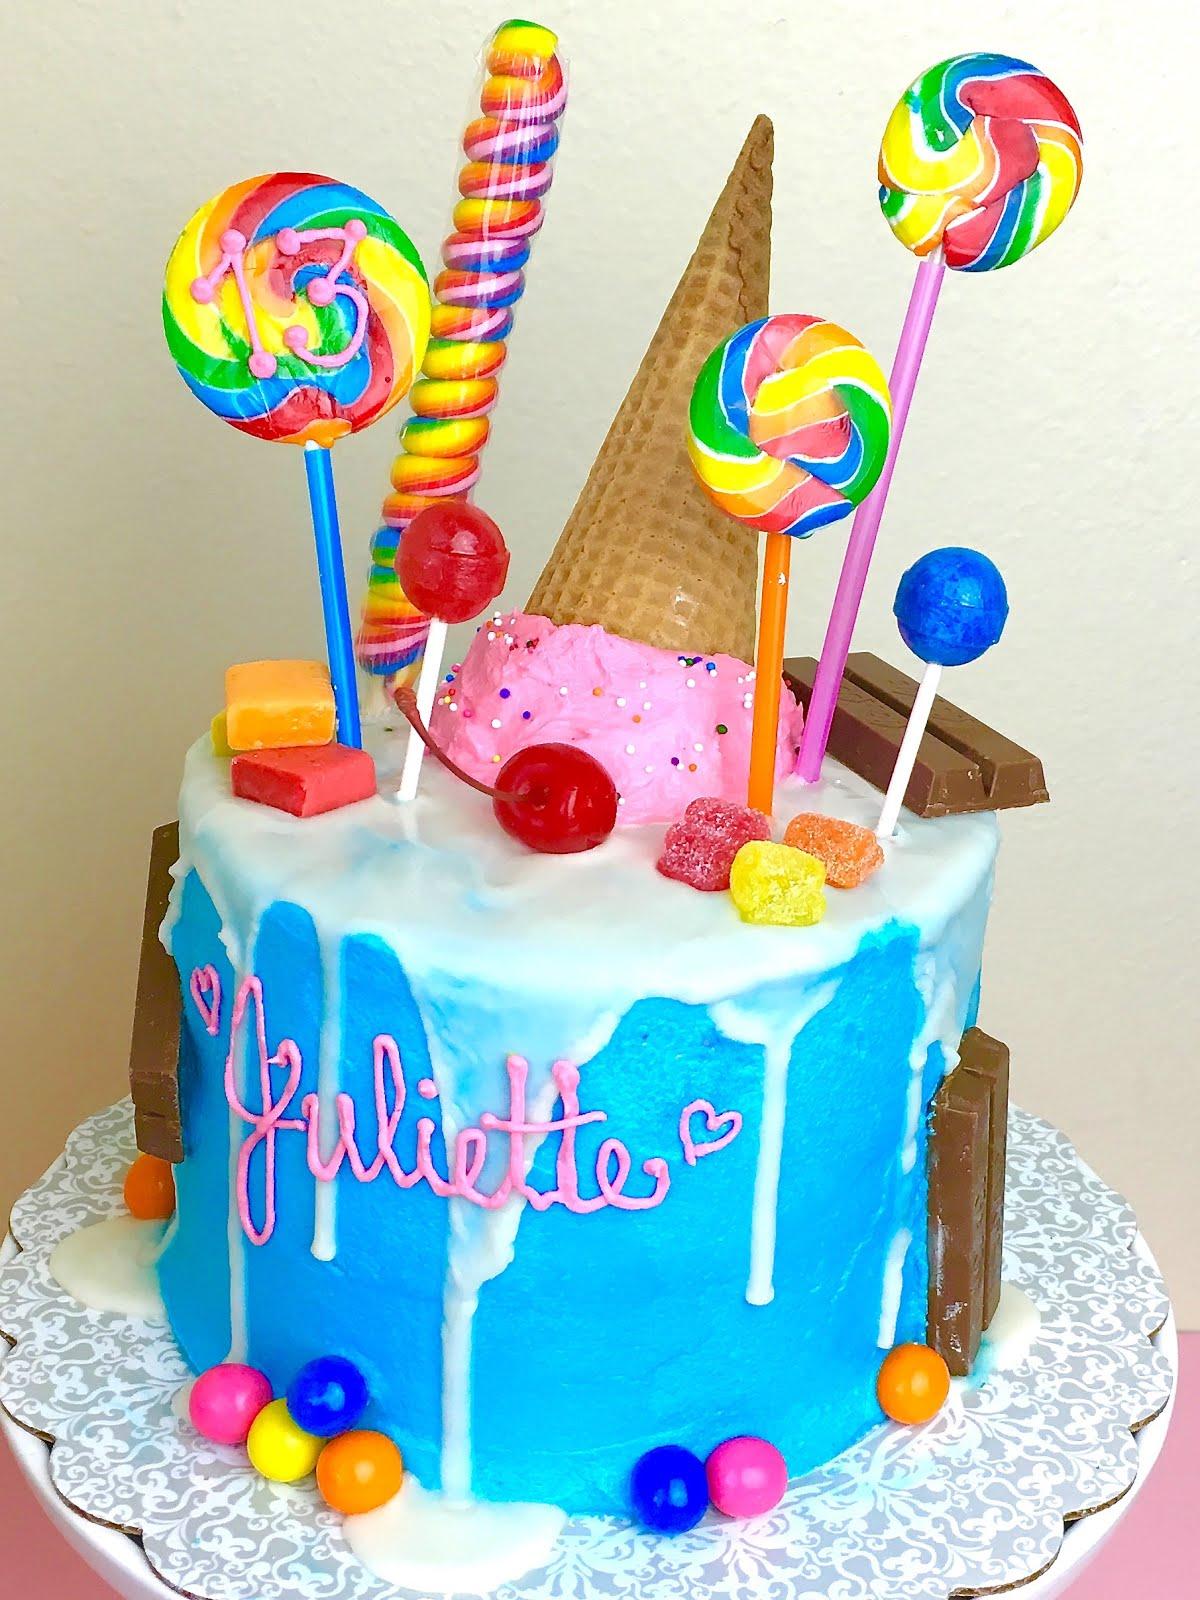 Easy Cake Lollipop Recipe